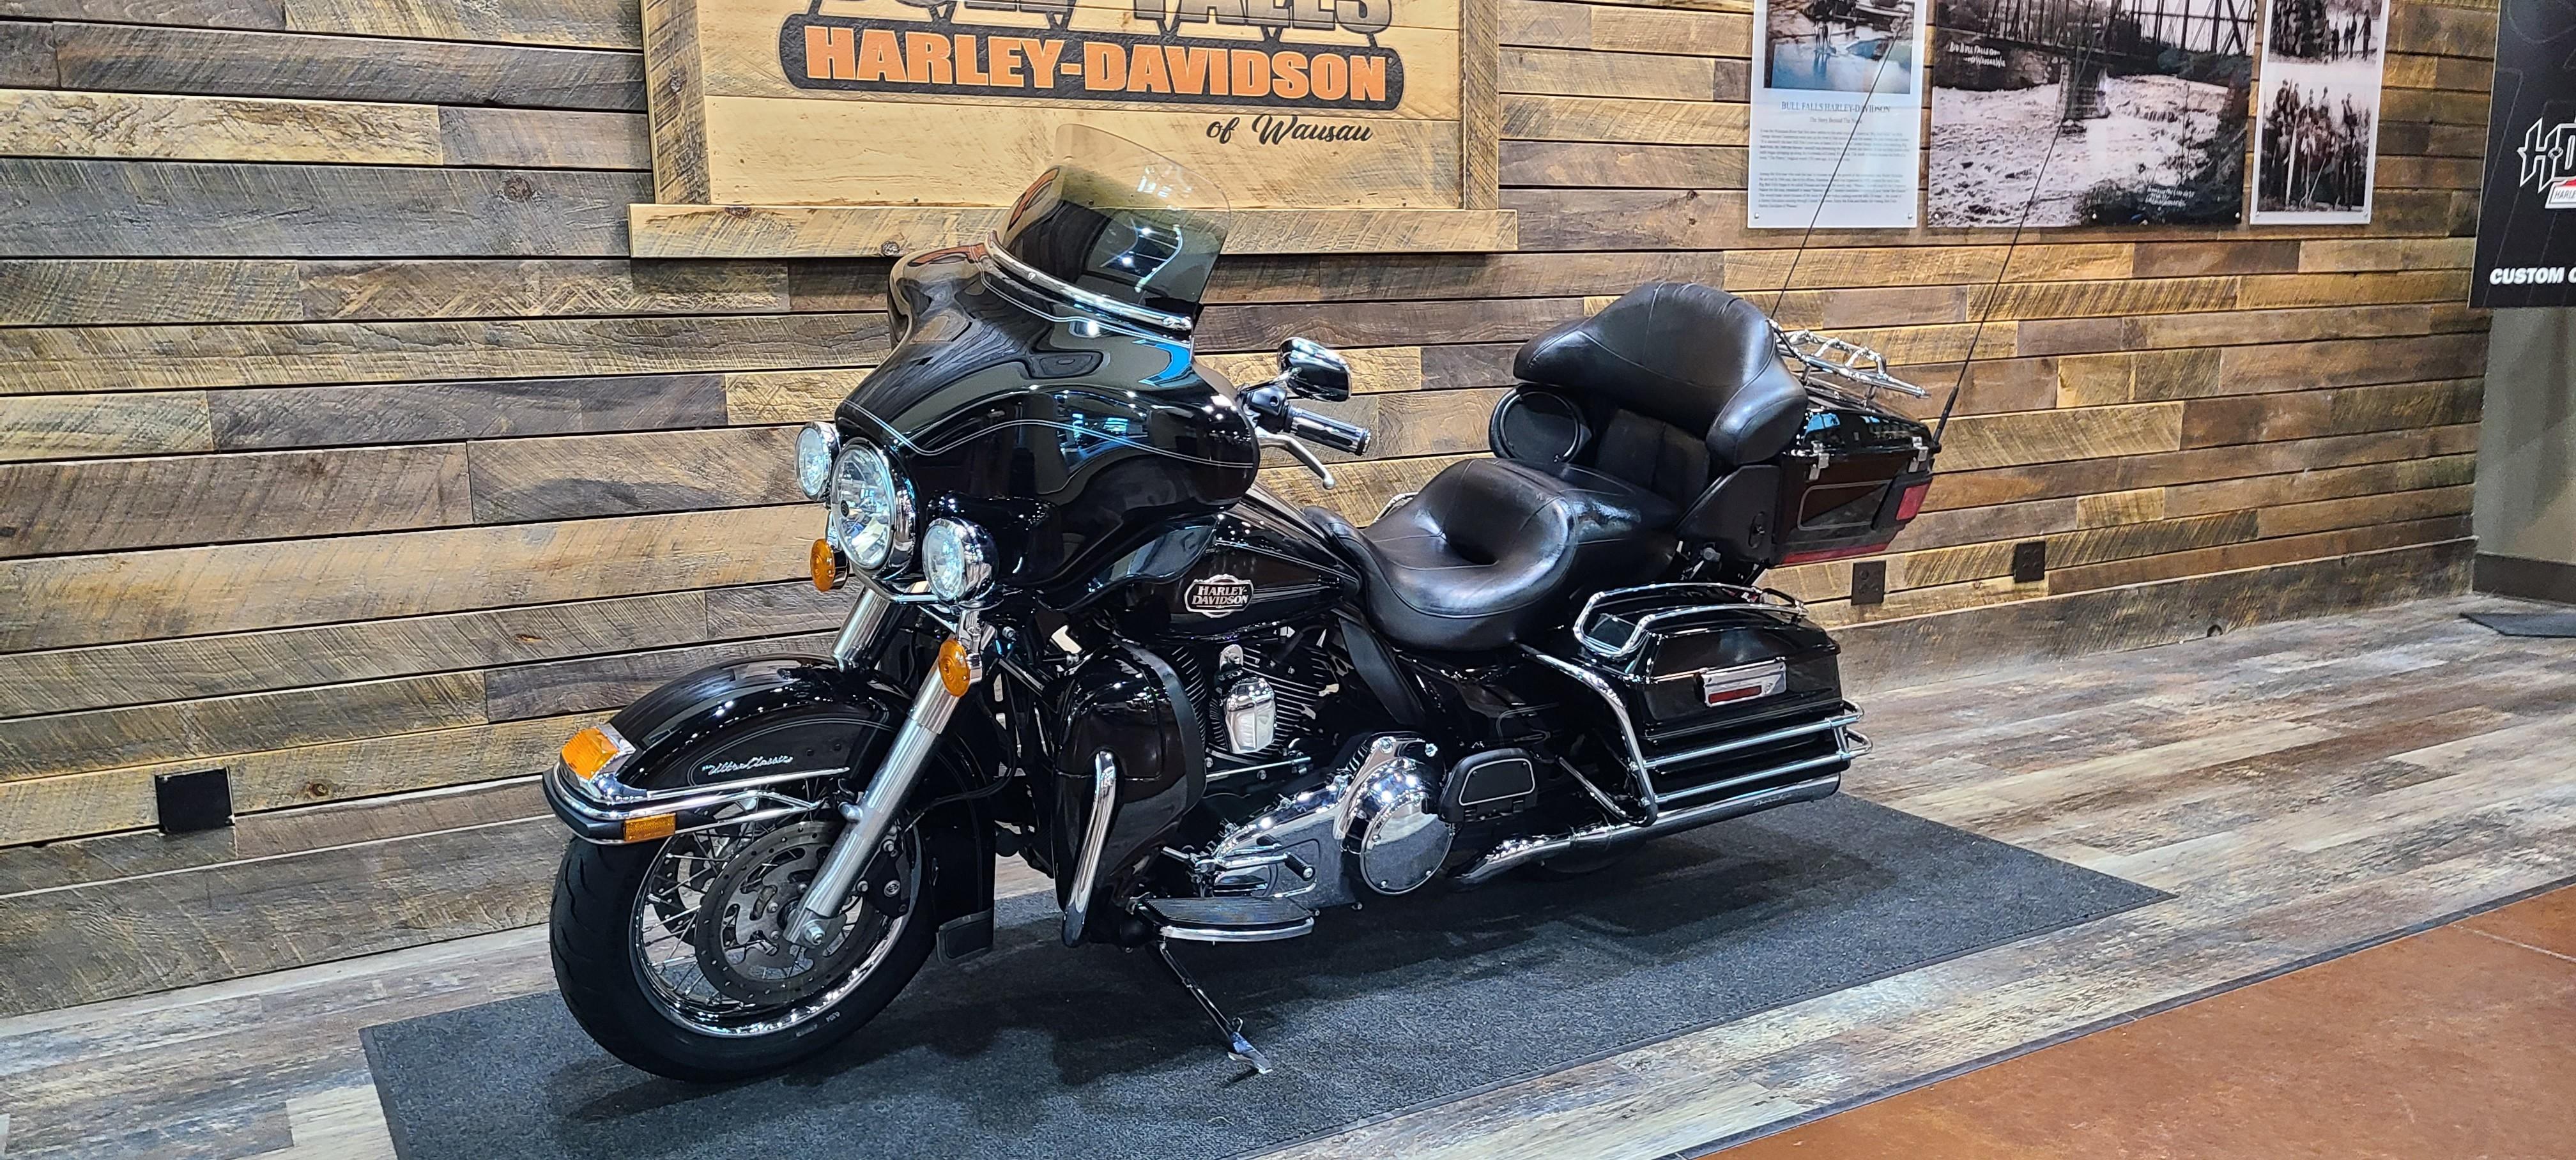 2010 Harley-Davidson Electra Glide Ultra Classic at Bull Falls Harley-Davidson